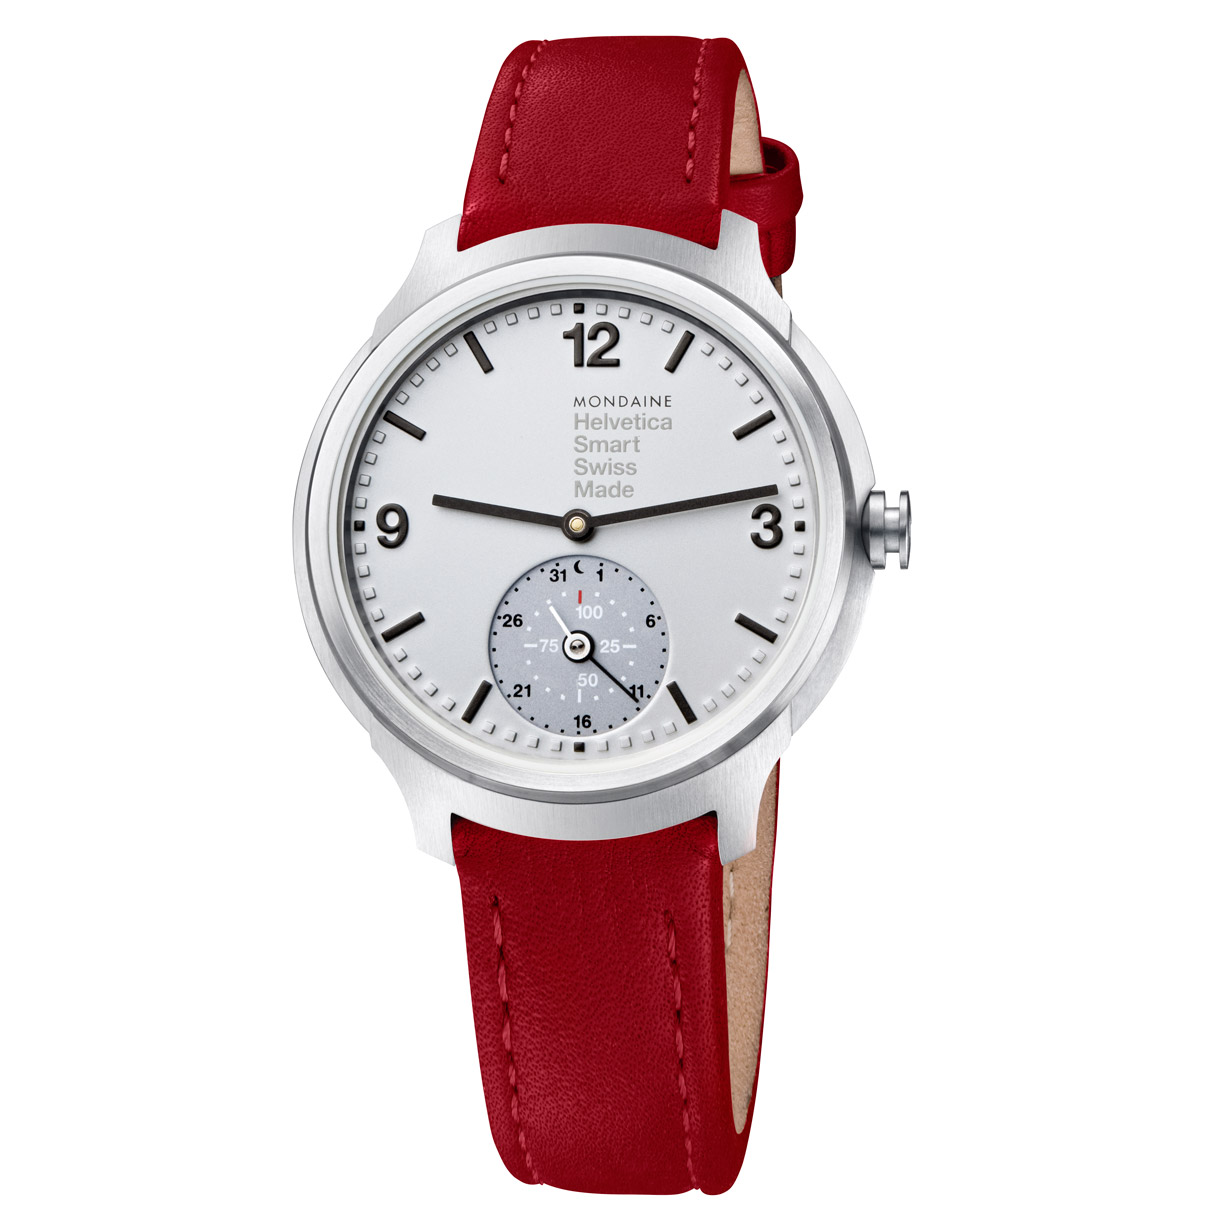 Mondaine Helvetica No 1 Smartwatch 44mm